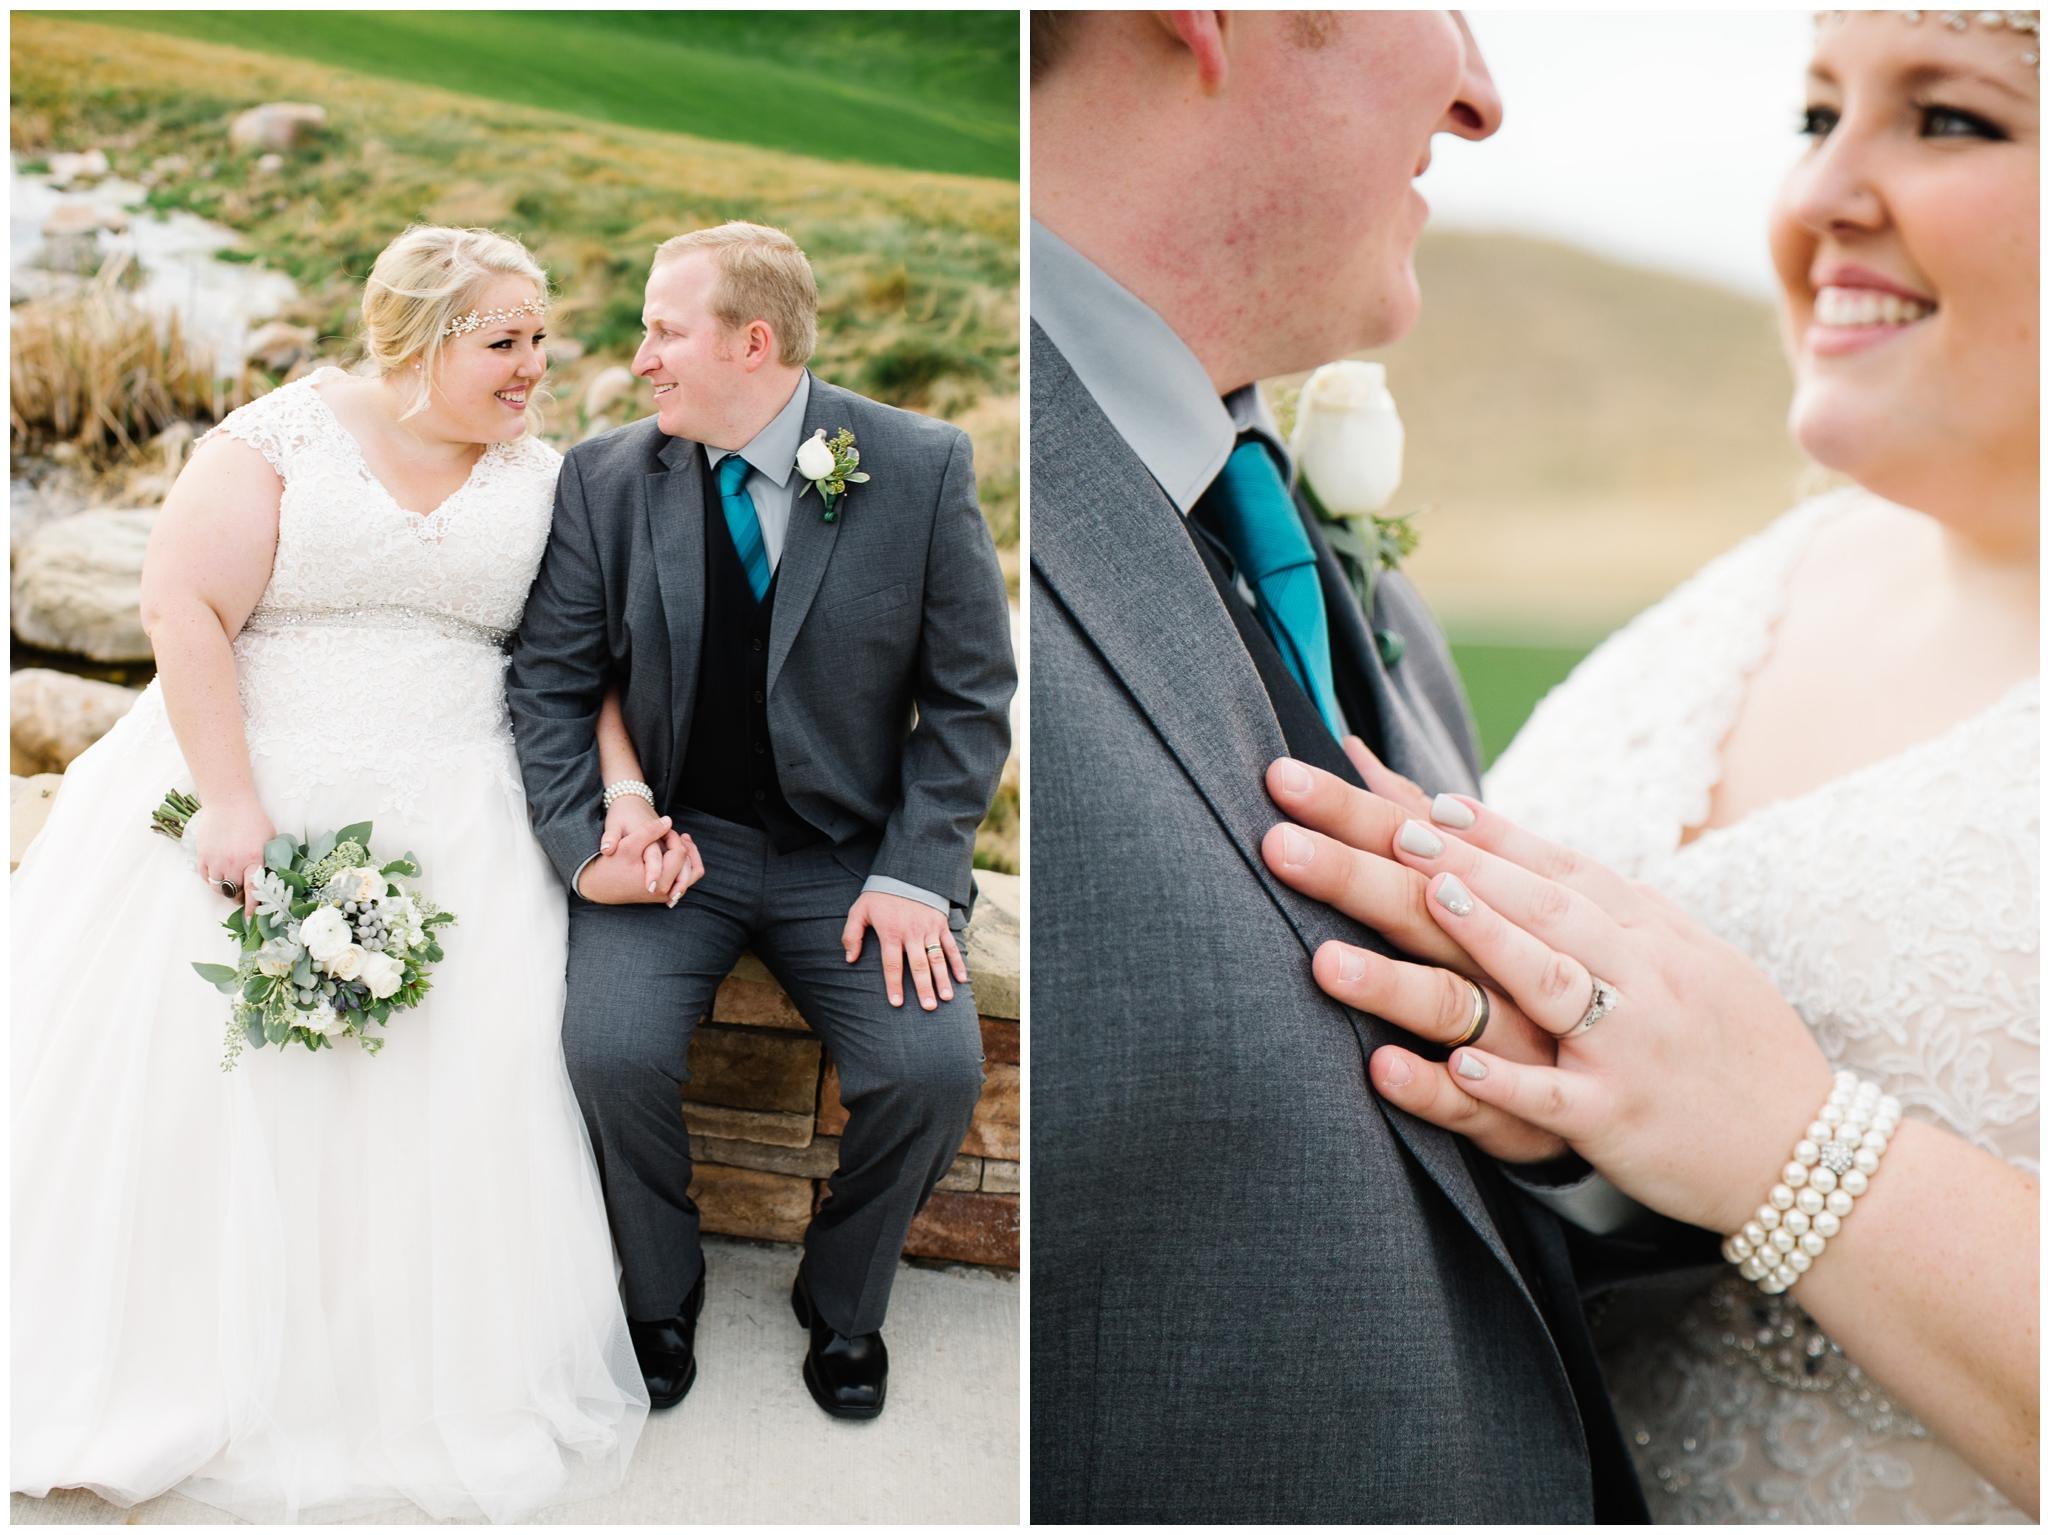 ChrisLeslie_Wedding_018.jpg